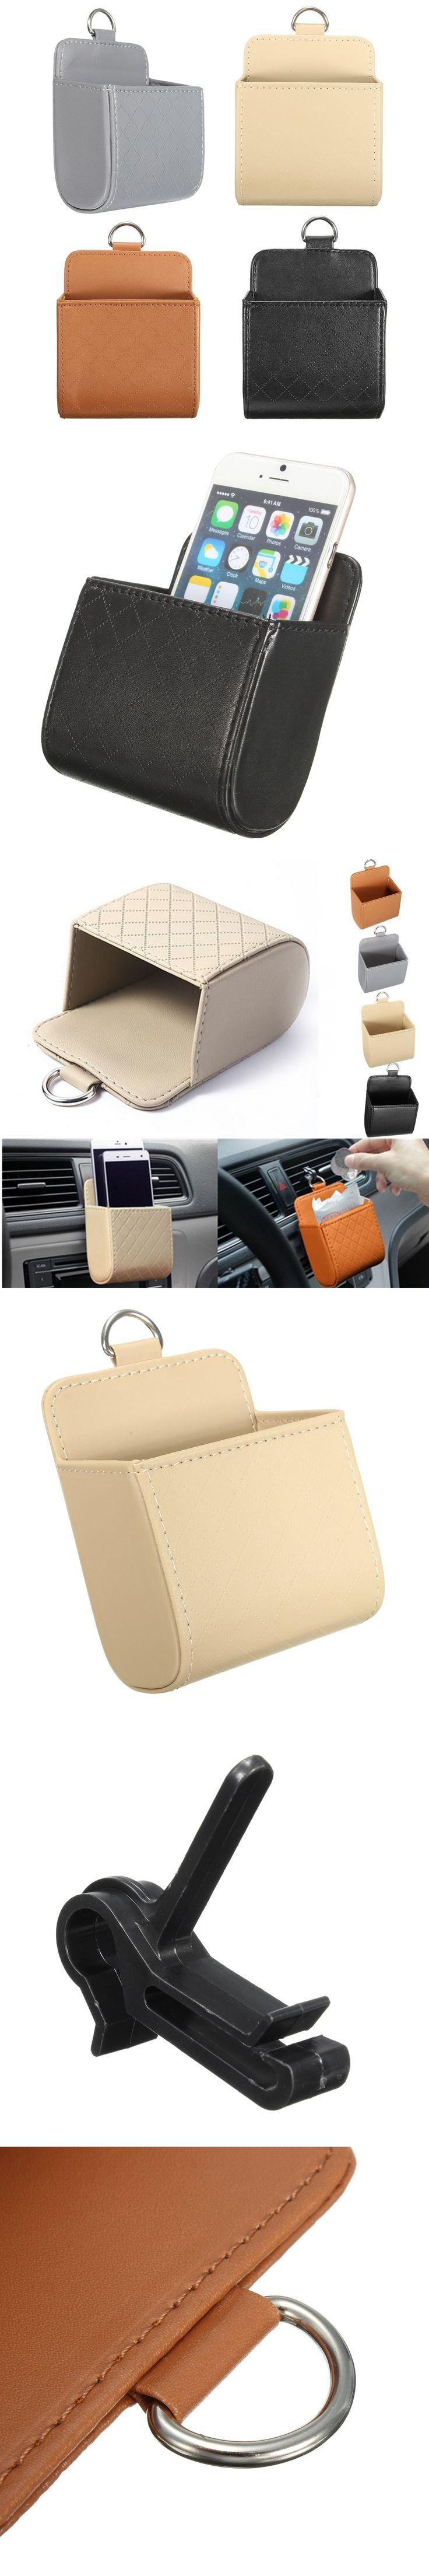 Auto Car PU Cell Phone Cradle Box Organizer Vehicle Storage Bag Holder